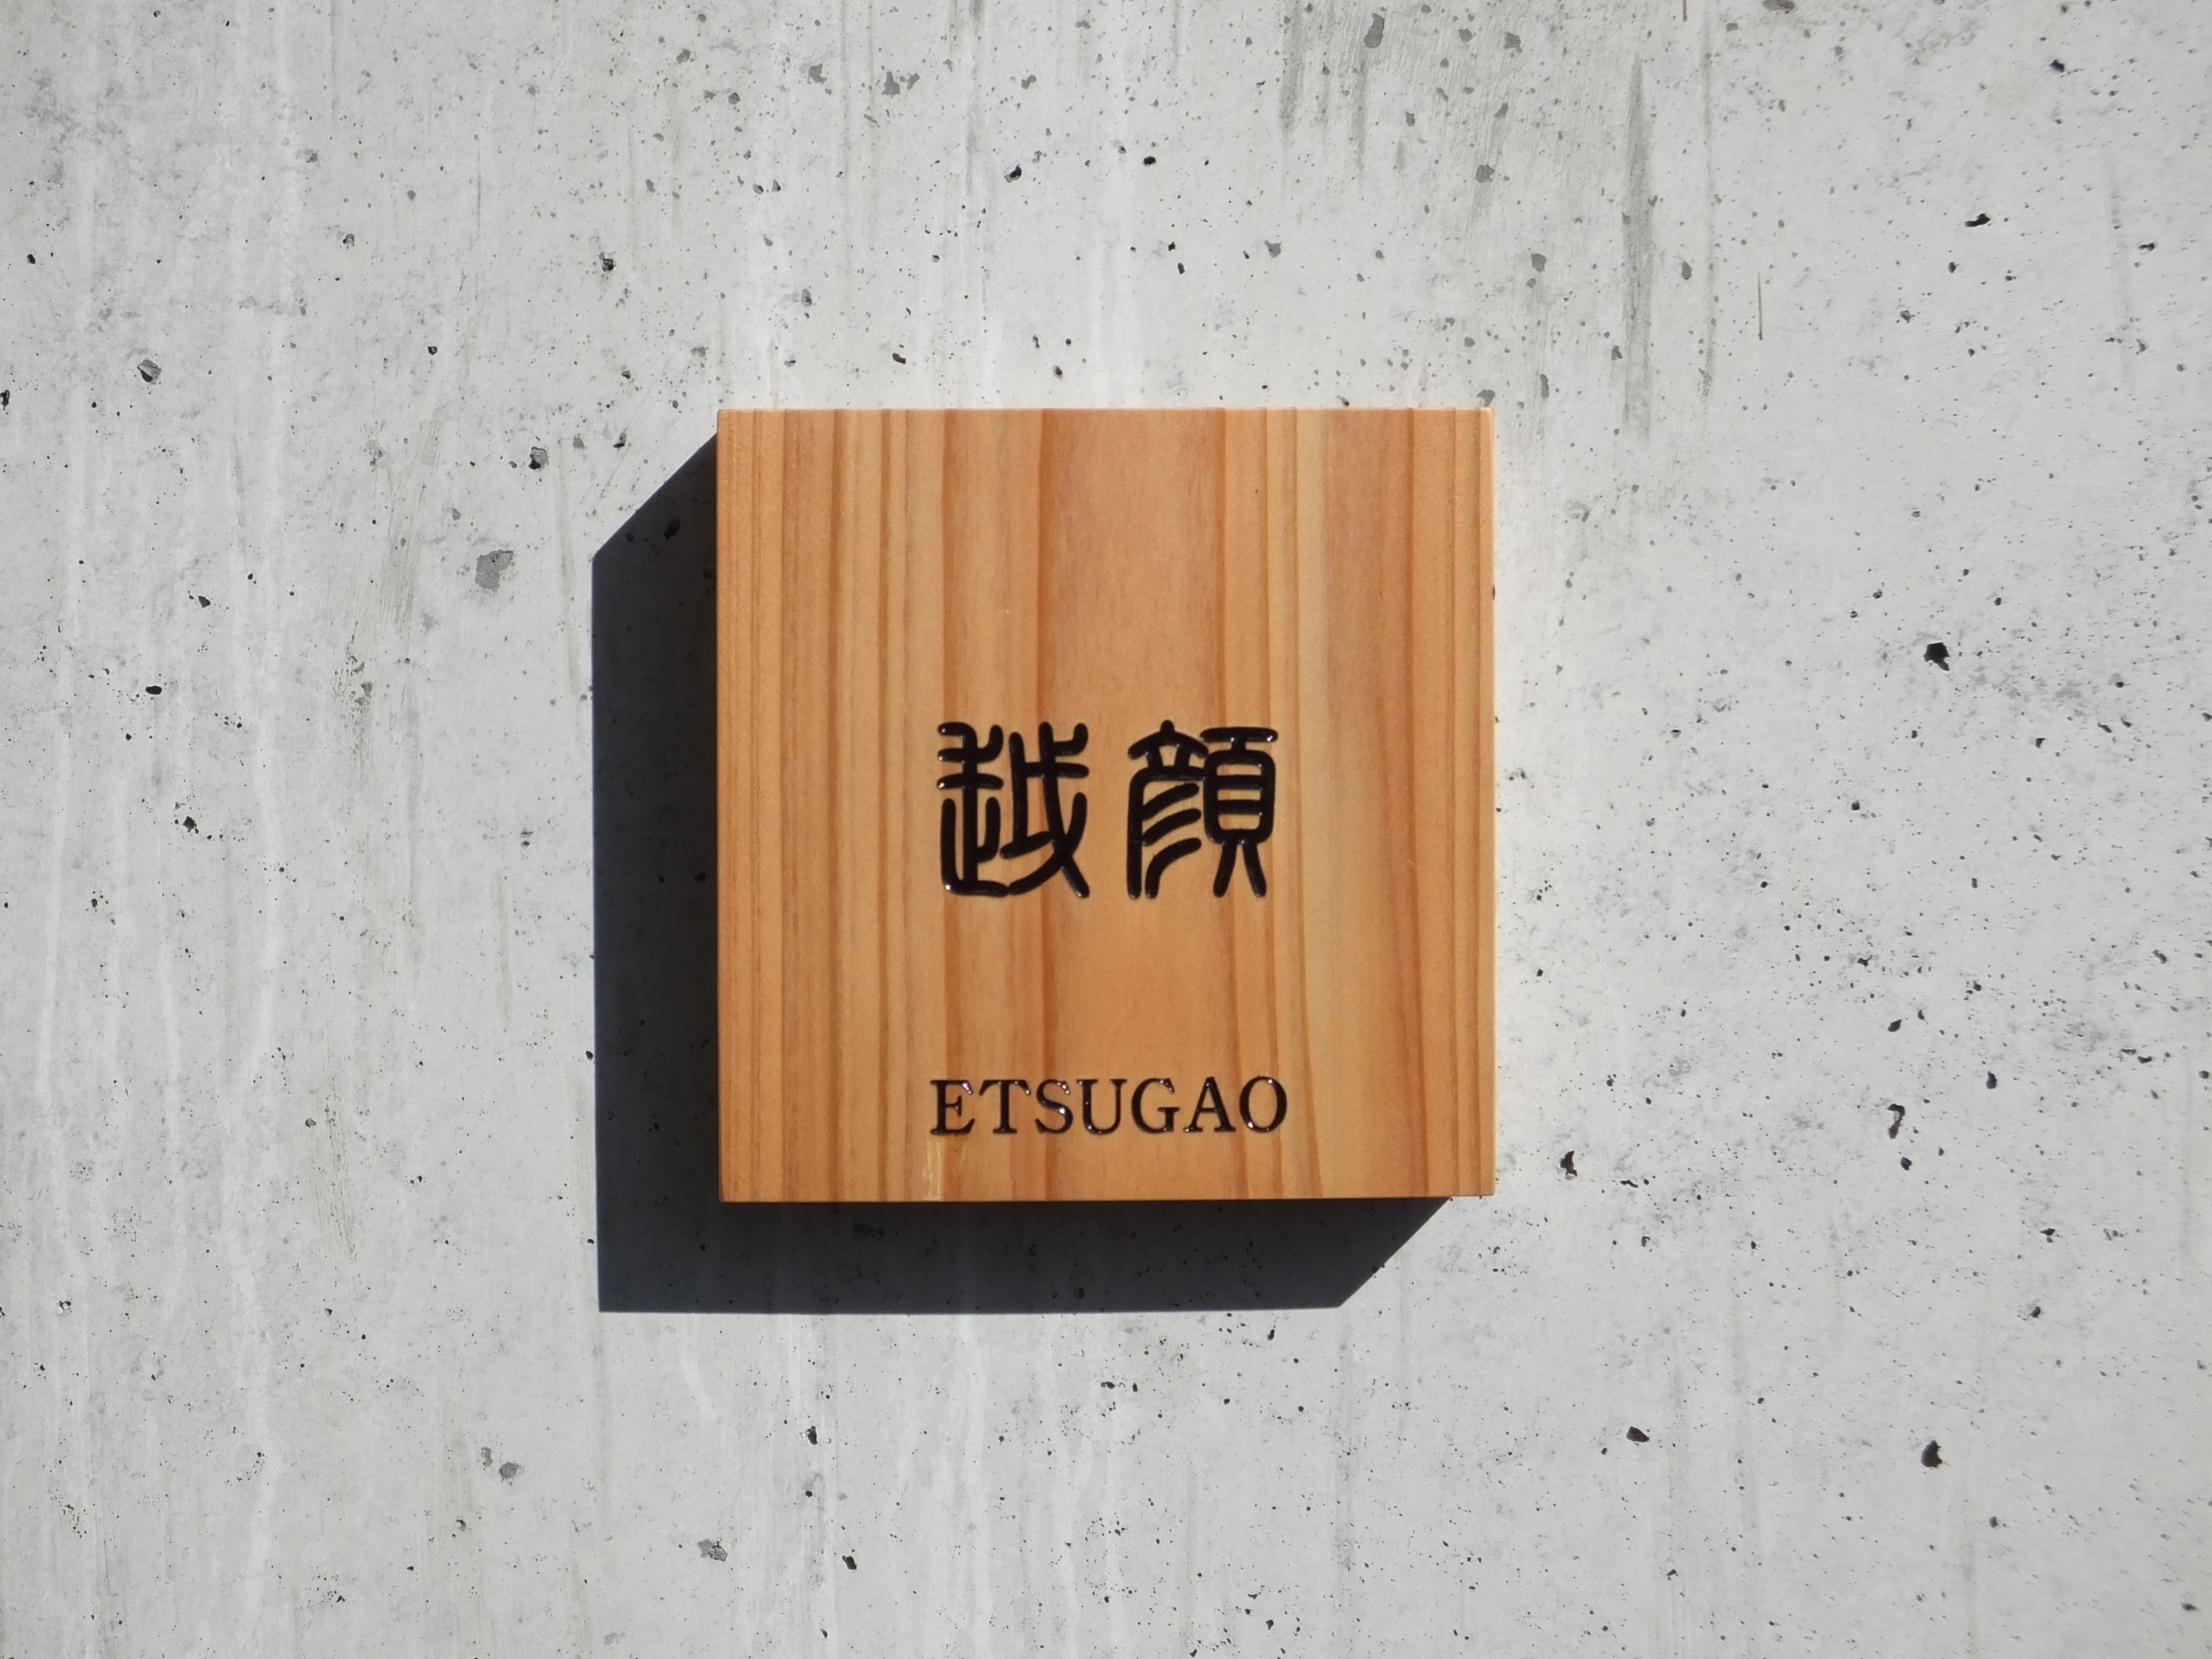 etsugaosumi-img